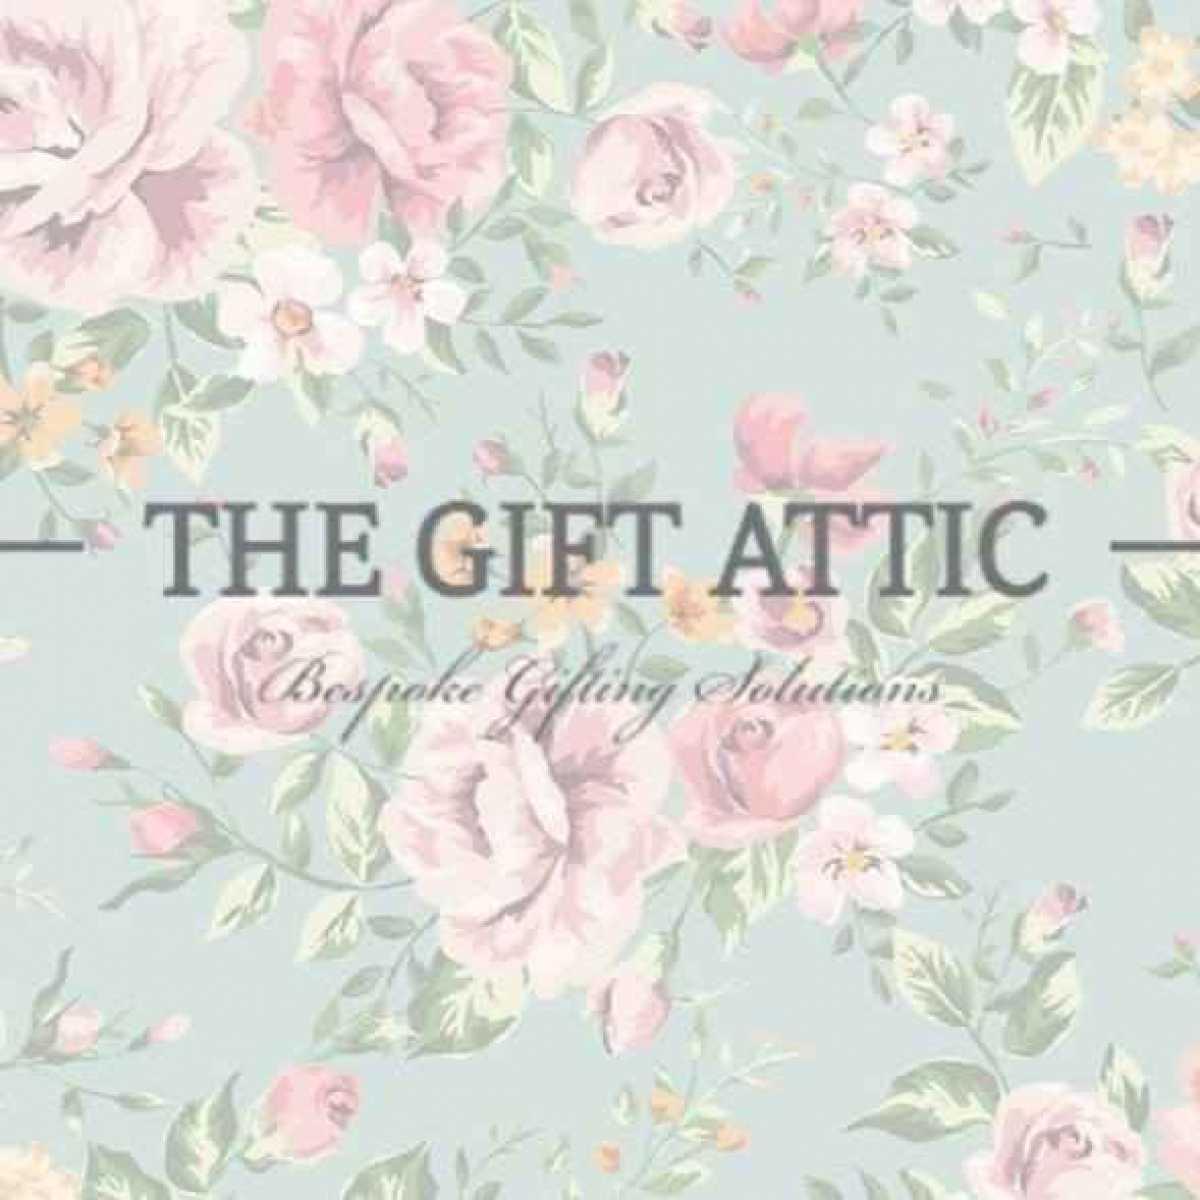 The Gift Attic